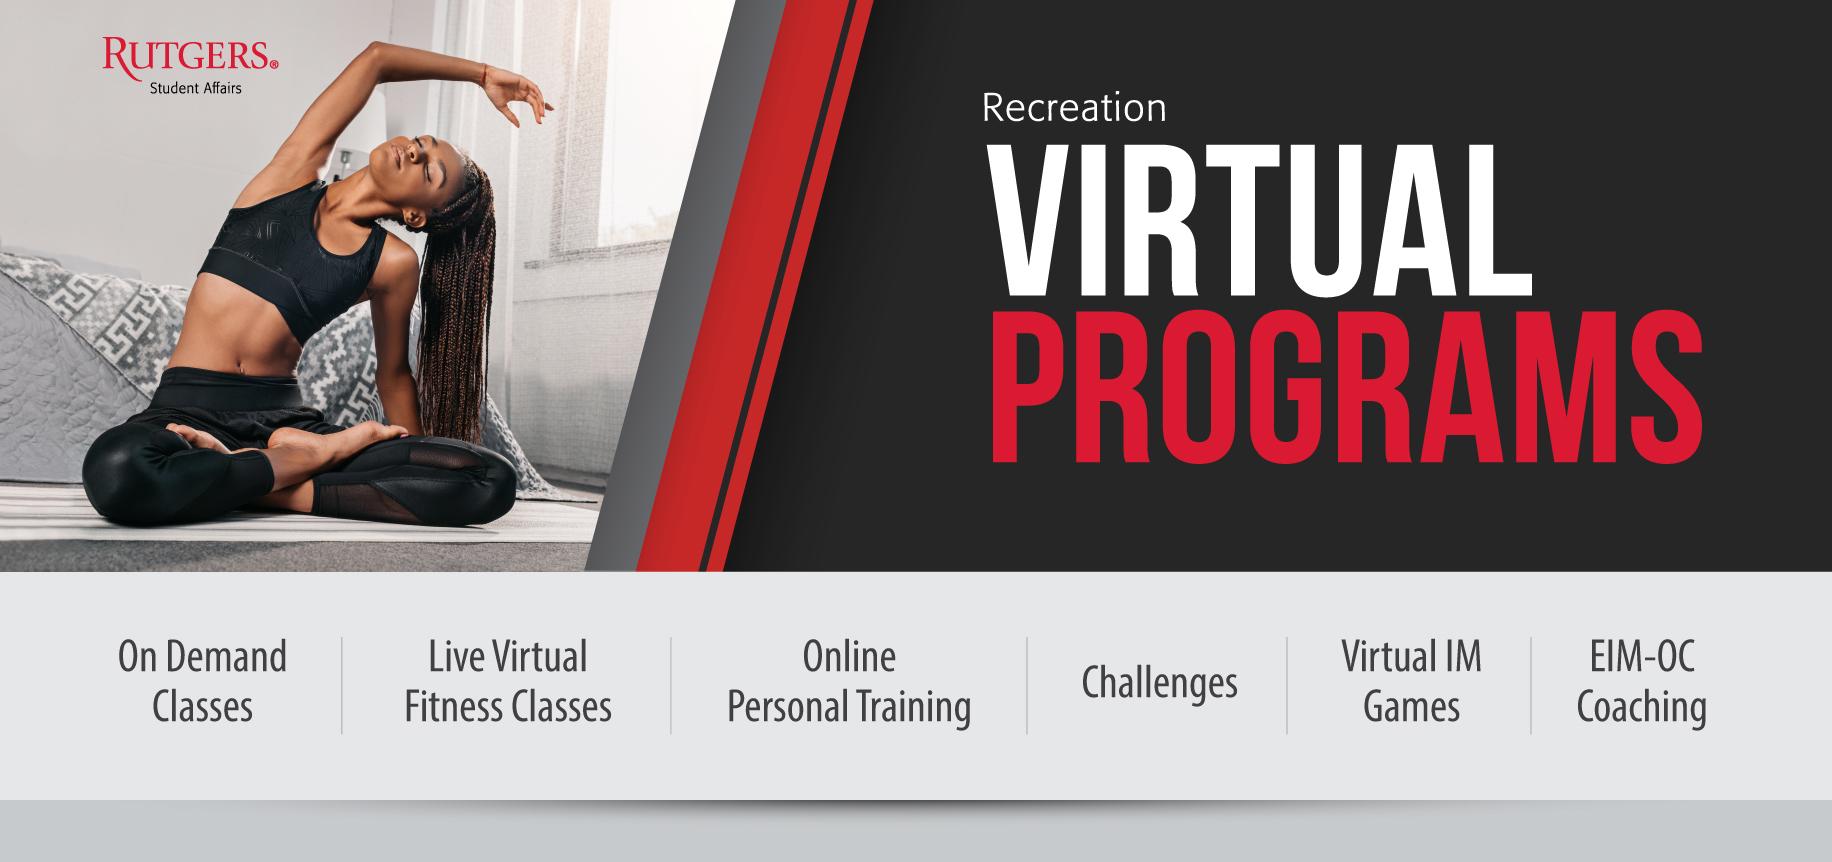 Virtual Programs Recreation